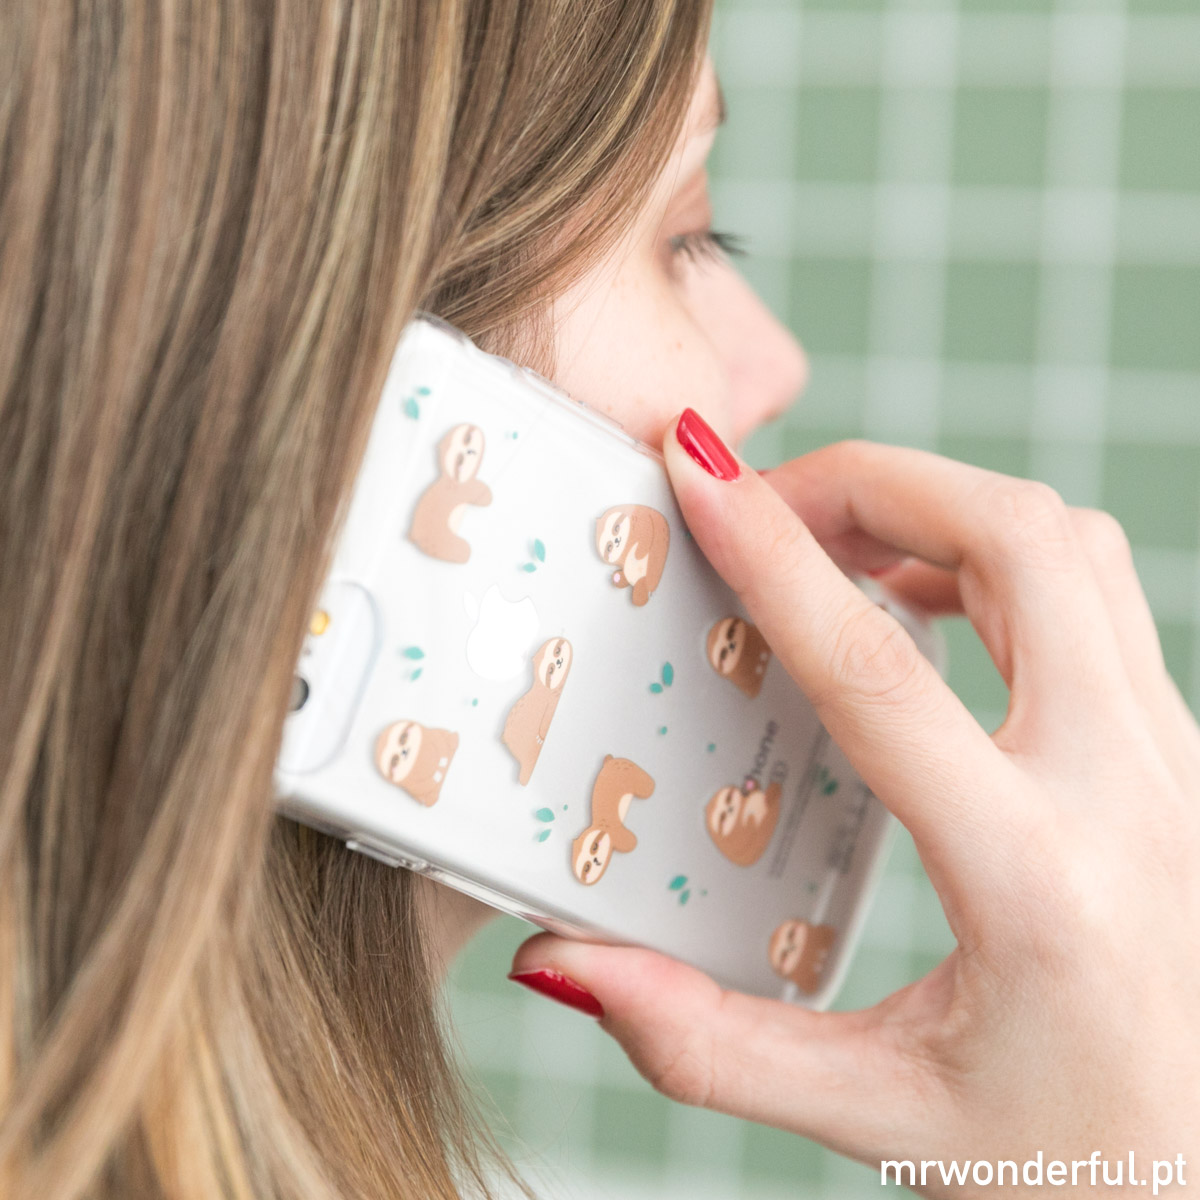 capa iphone preguiça mr wonderful